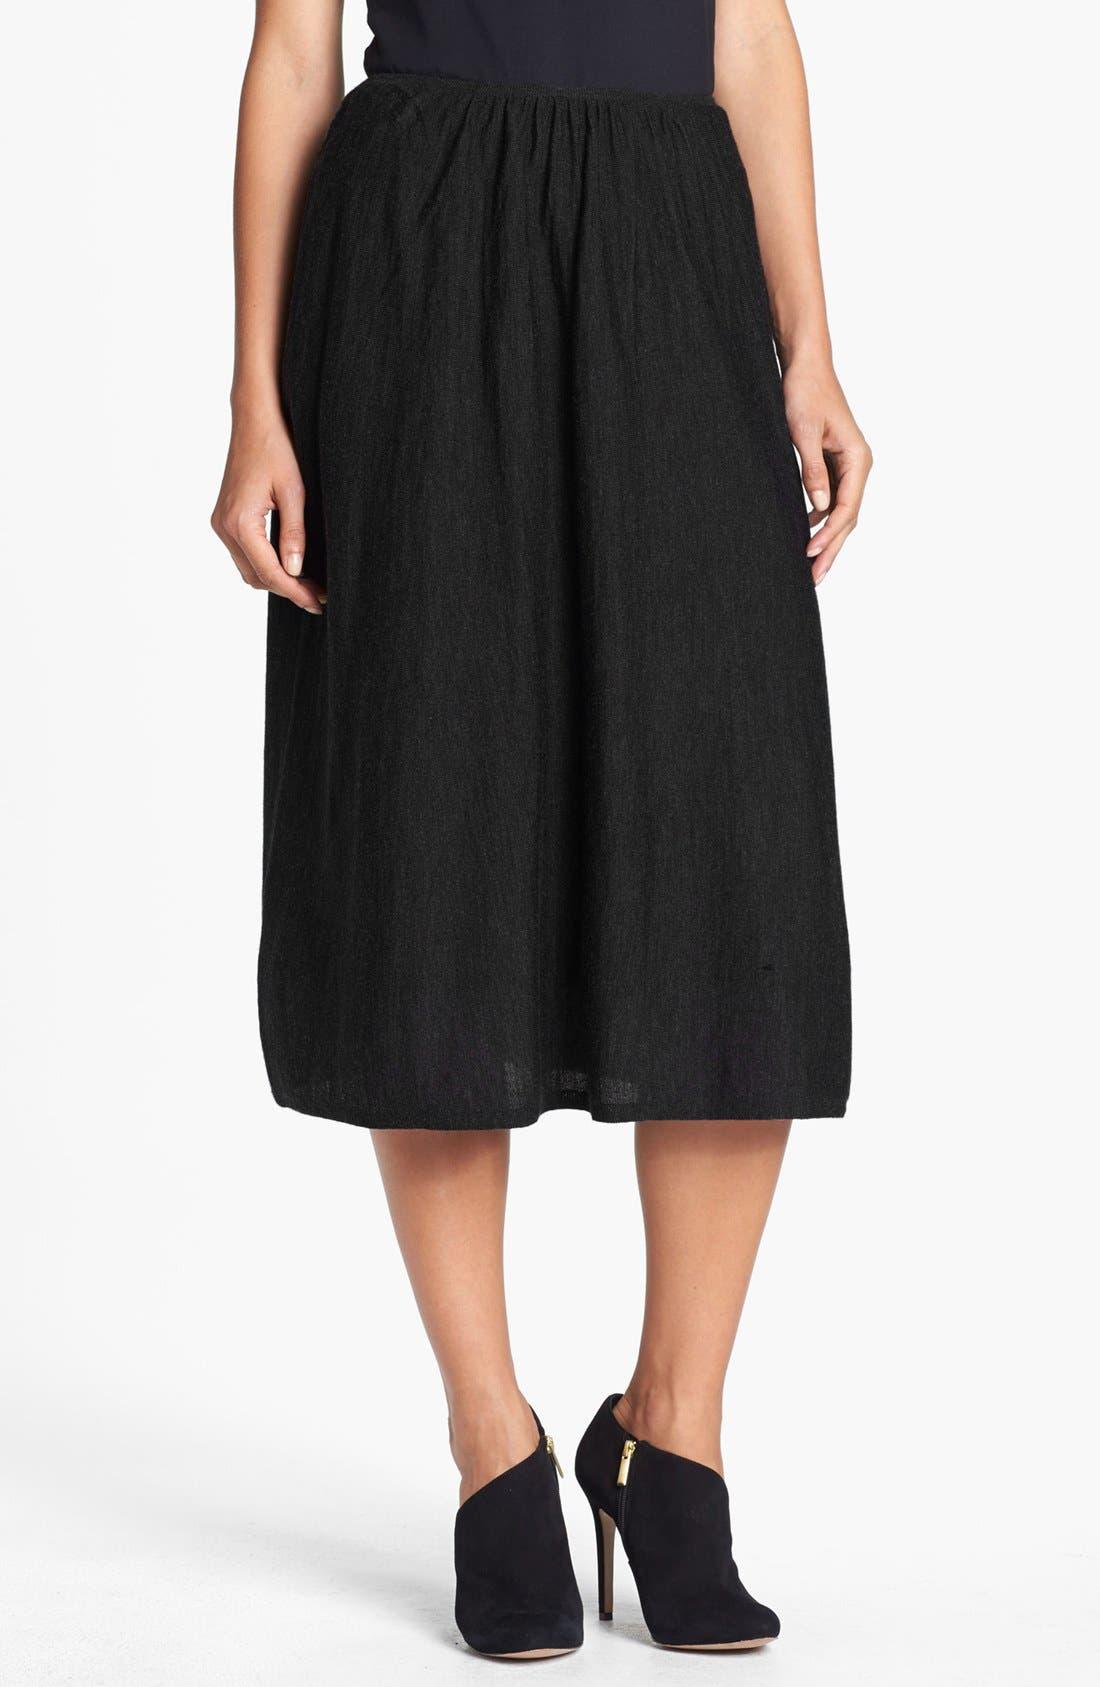 EILEEN FISHER, Merino Wool Jersey Skirt, Main thumbnail 1, color, 001